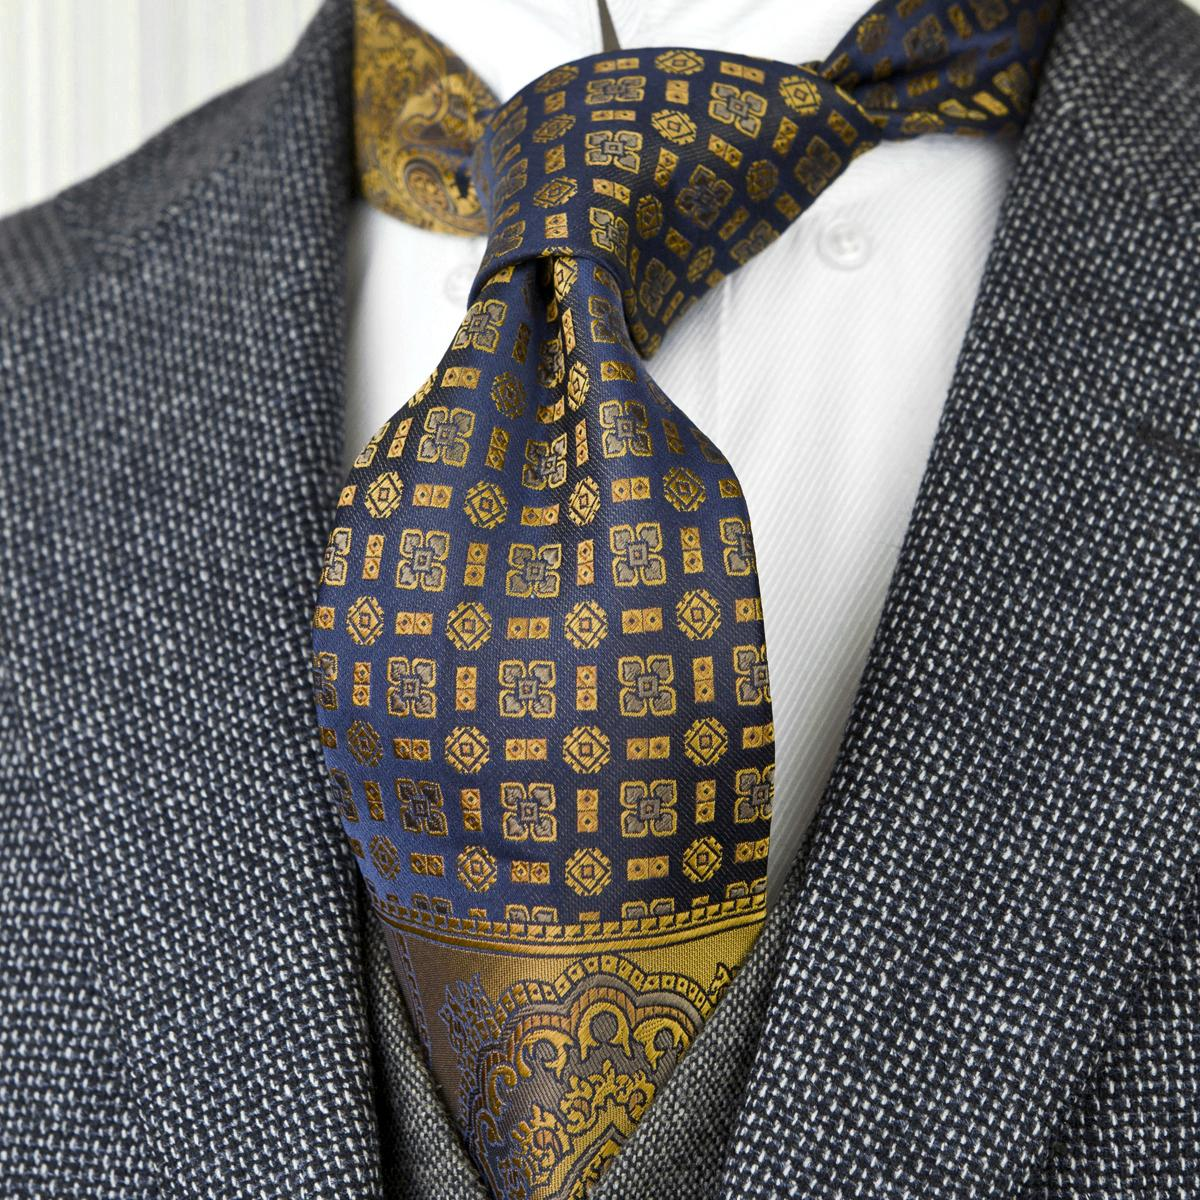 Freies verschiffen F22 multicolor braun gold gelb navy blau floral herren krawatten krawatten taschenquadrat 100% seide jacquard gewebt krawatte set thanky